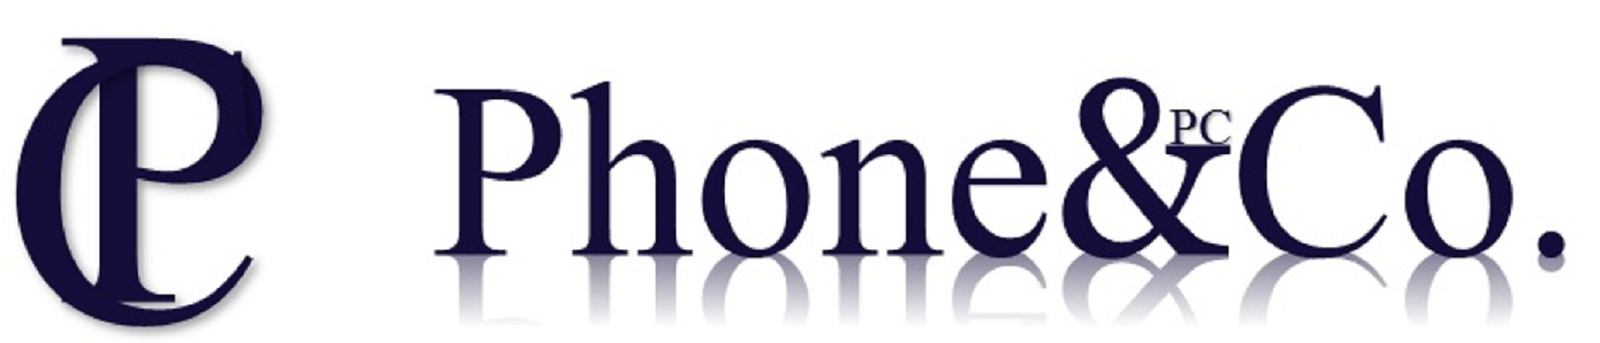 Phone&Co.